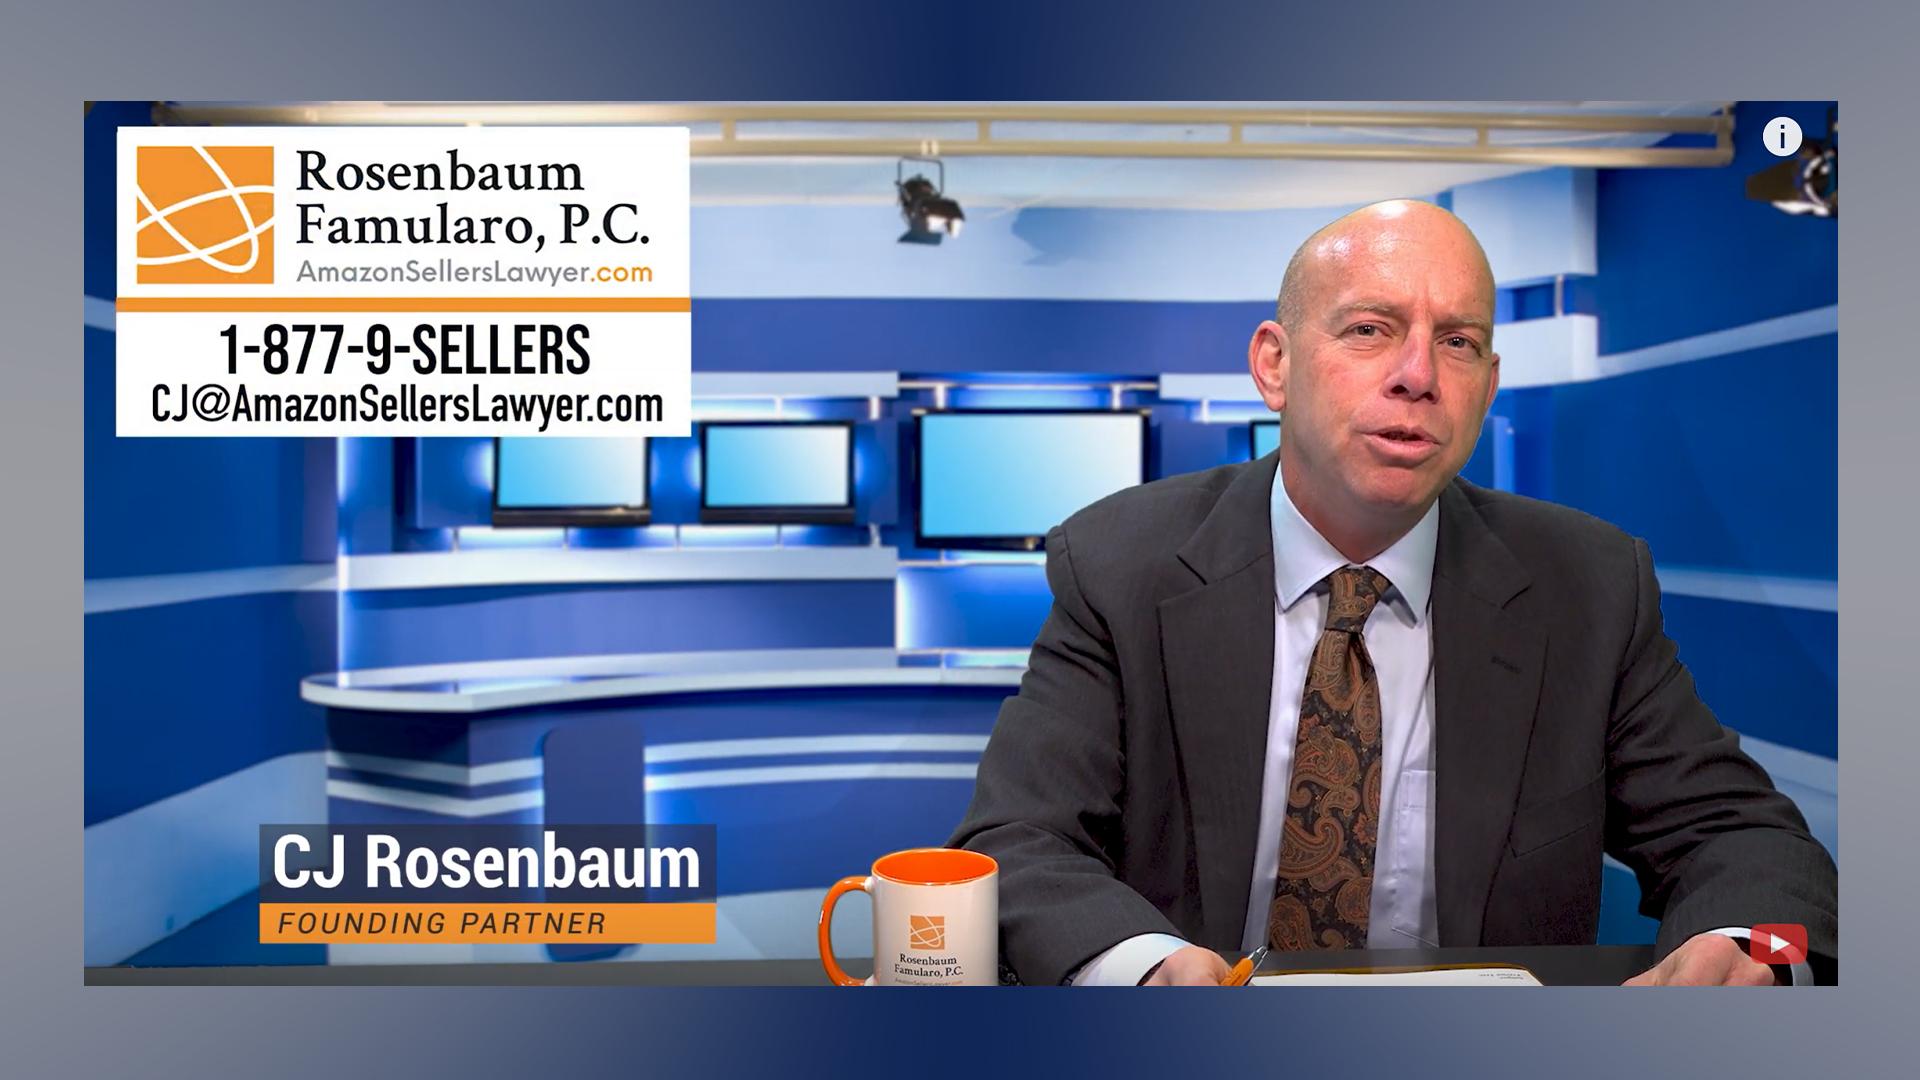 Amazon Seller False Counterfeit Complaints, Related Amz Accounts & Amazon's Refusal To Release Money